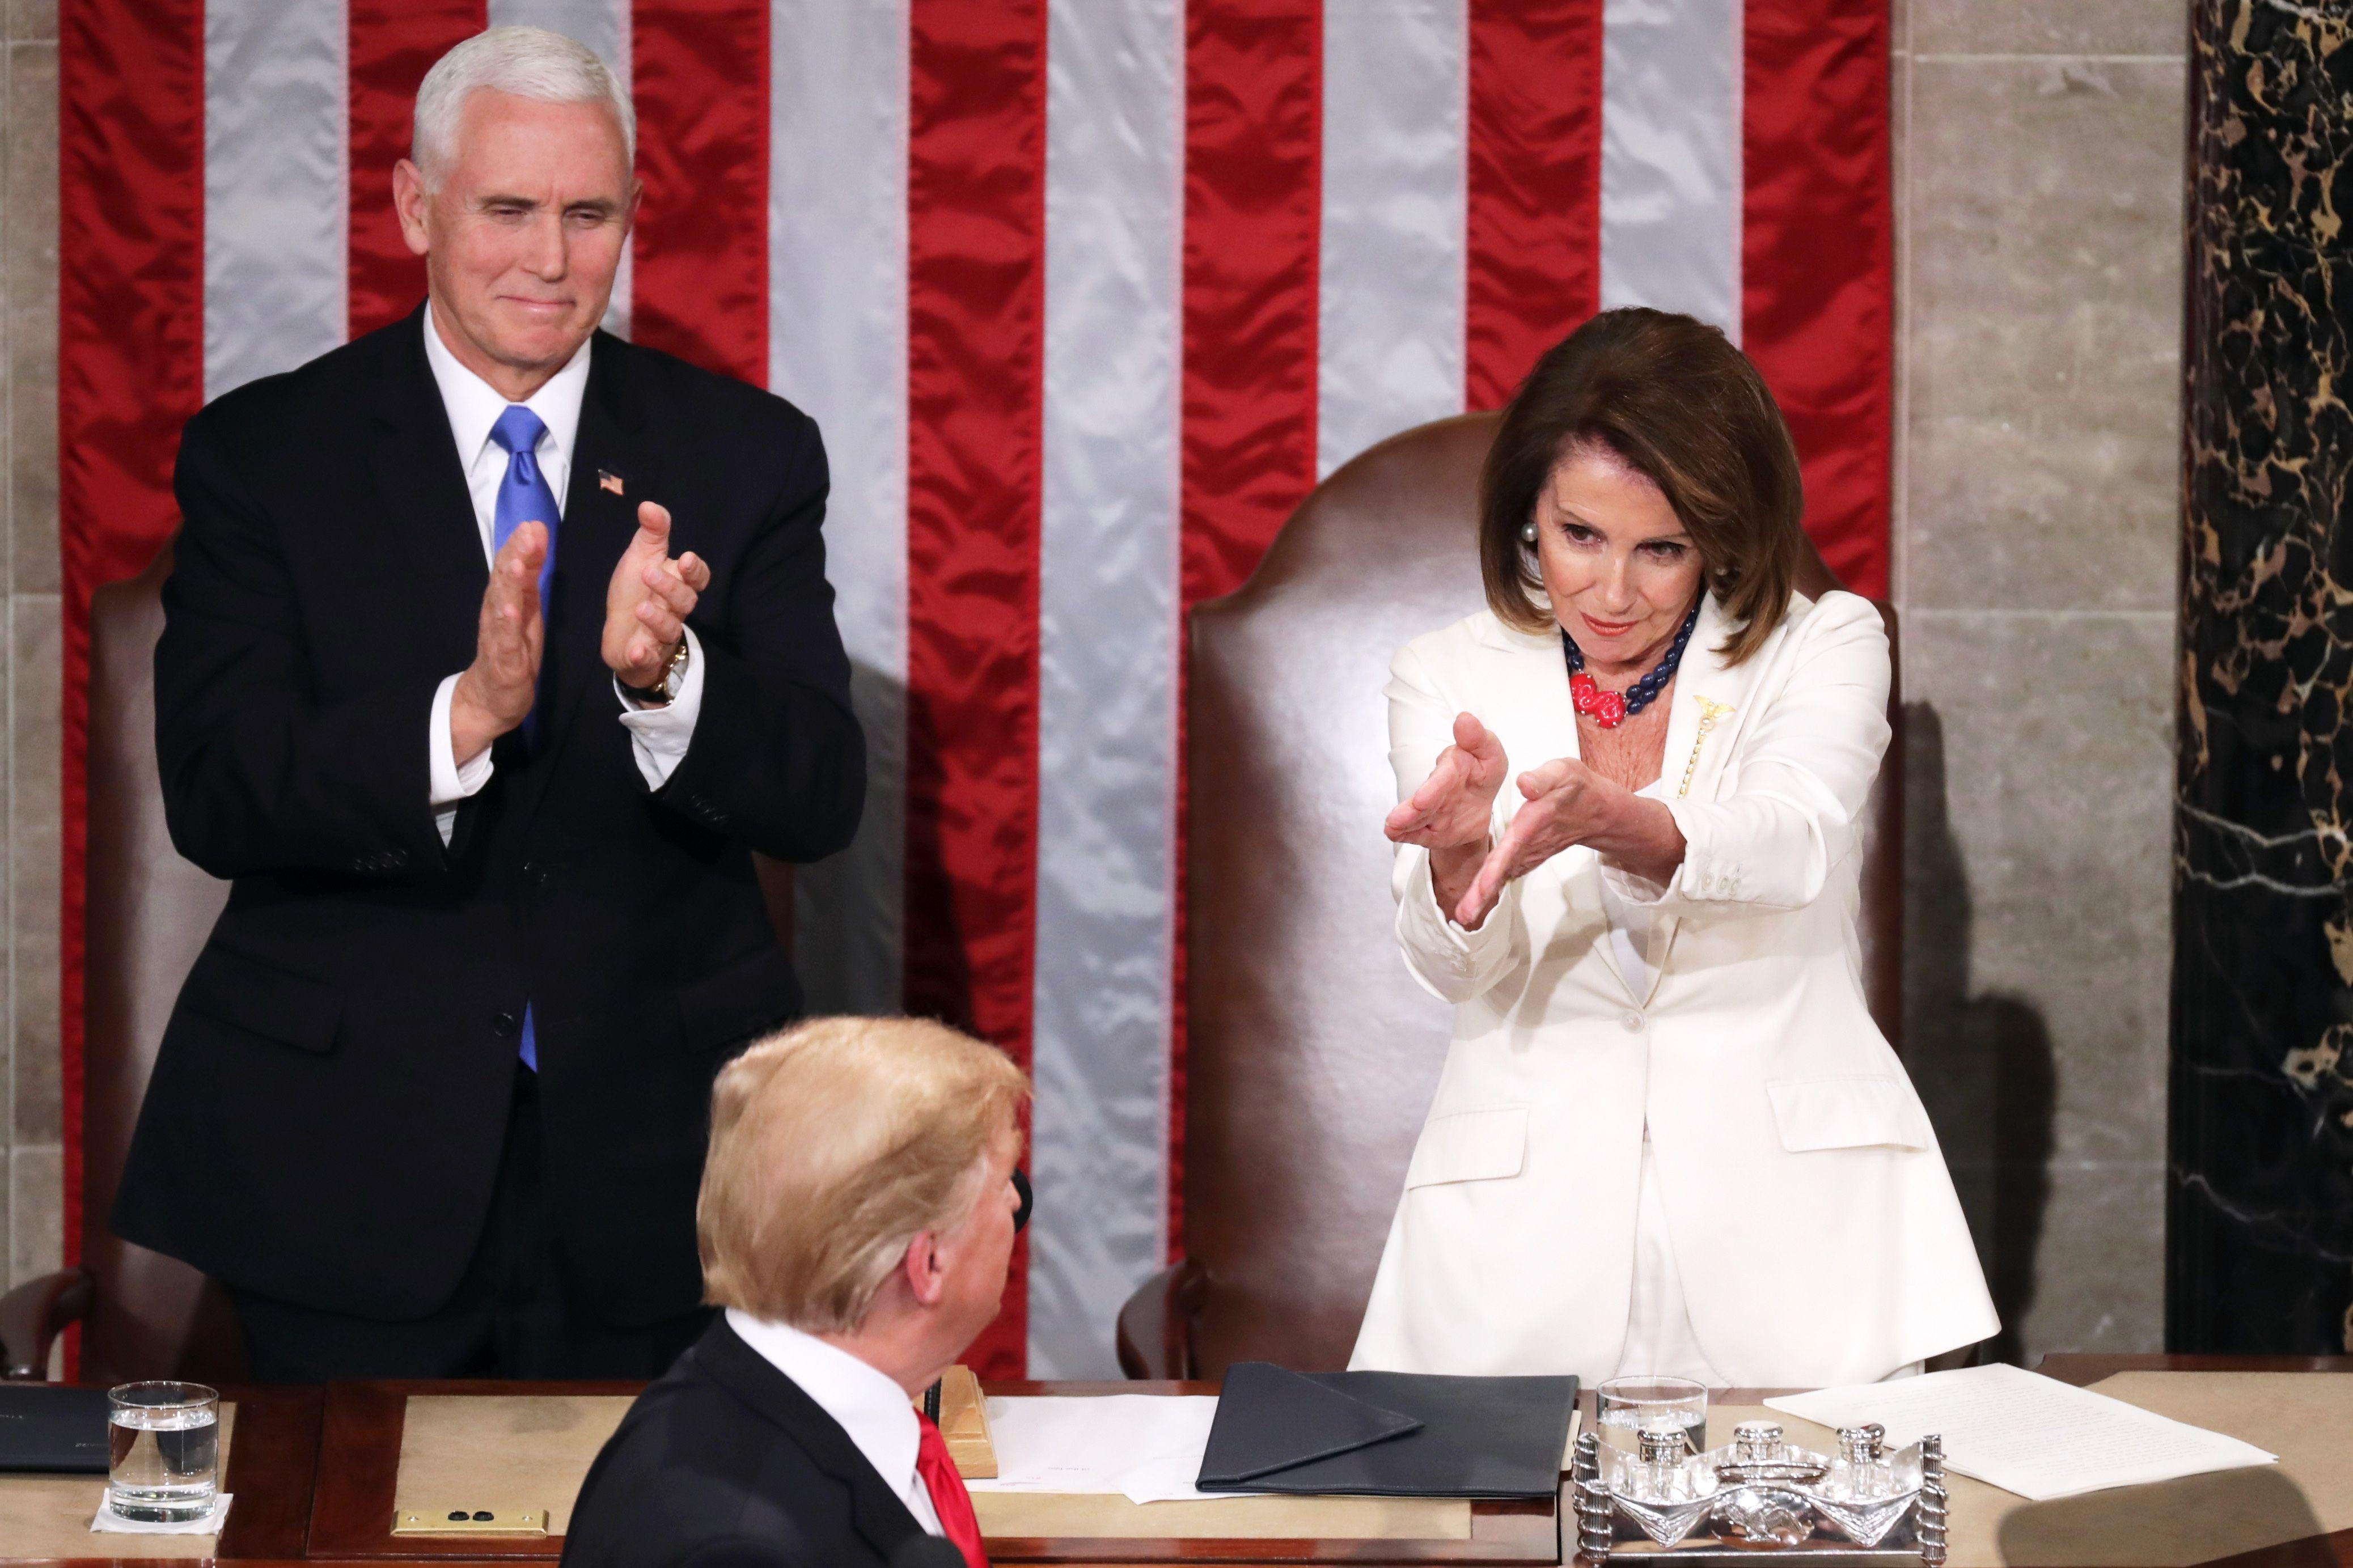 How to Dress Like Nancy Pelosi and Donald Trump for Halloween